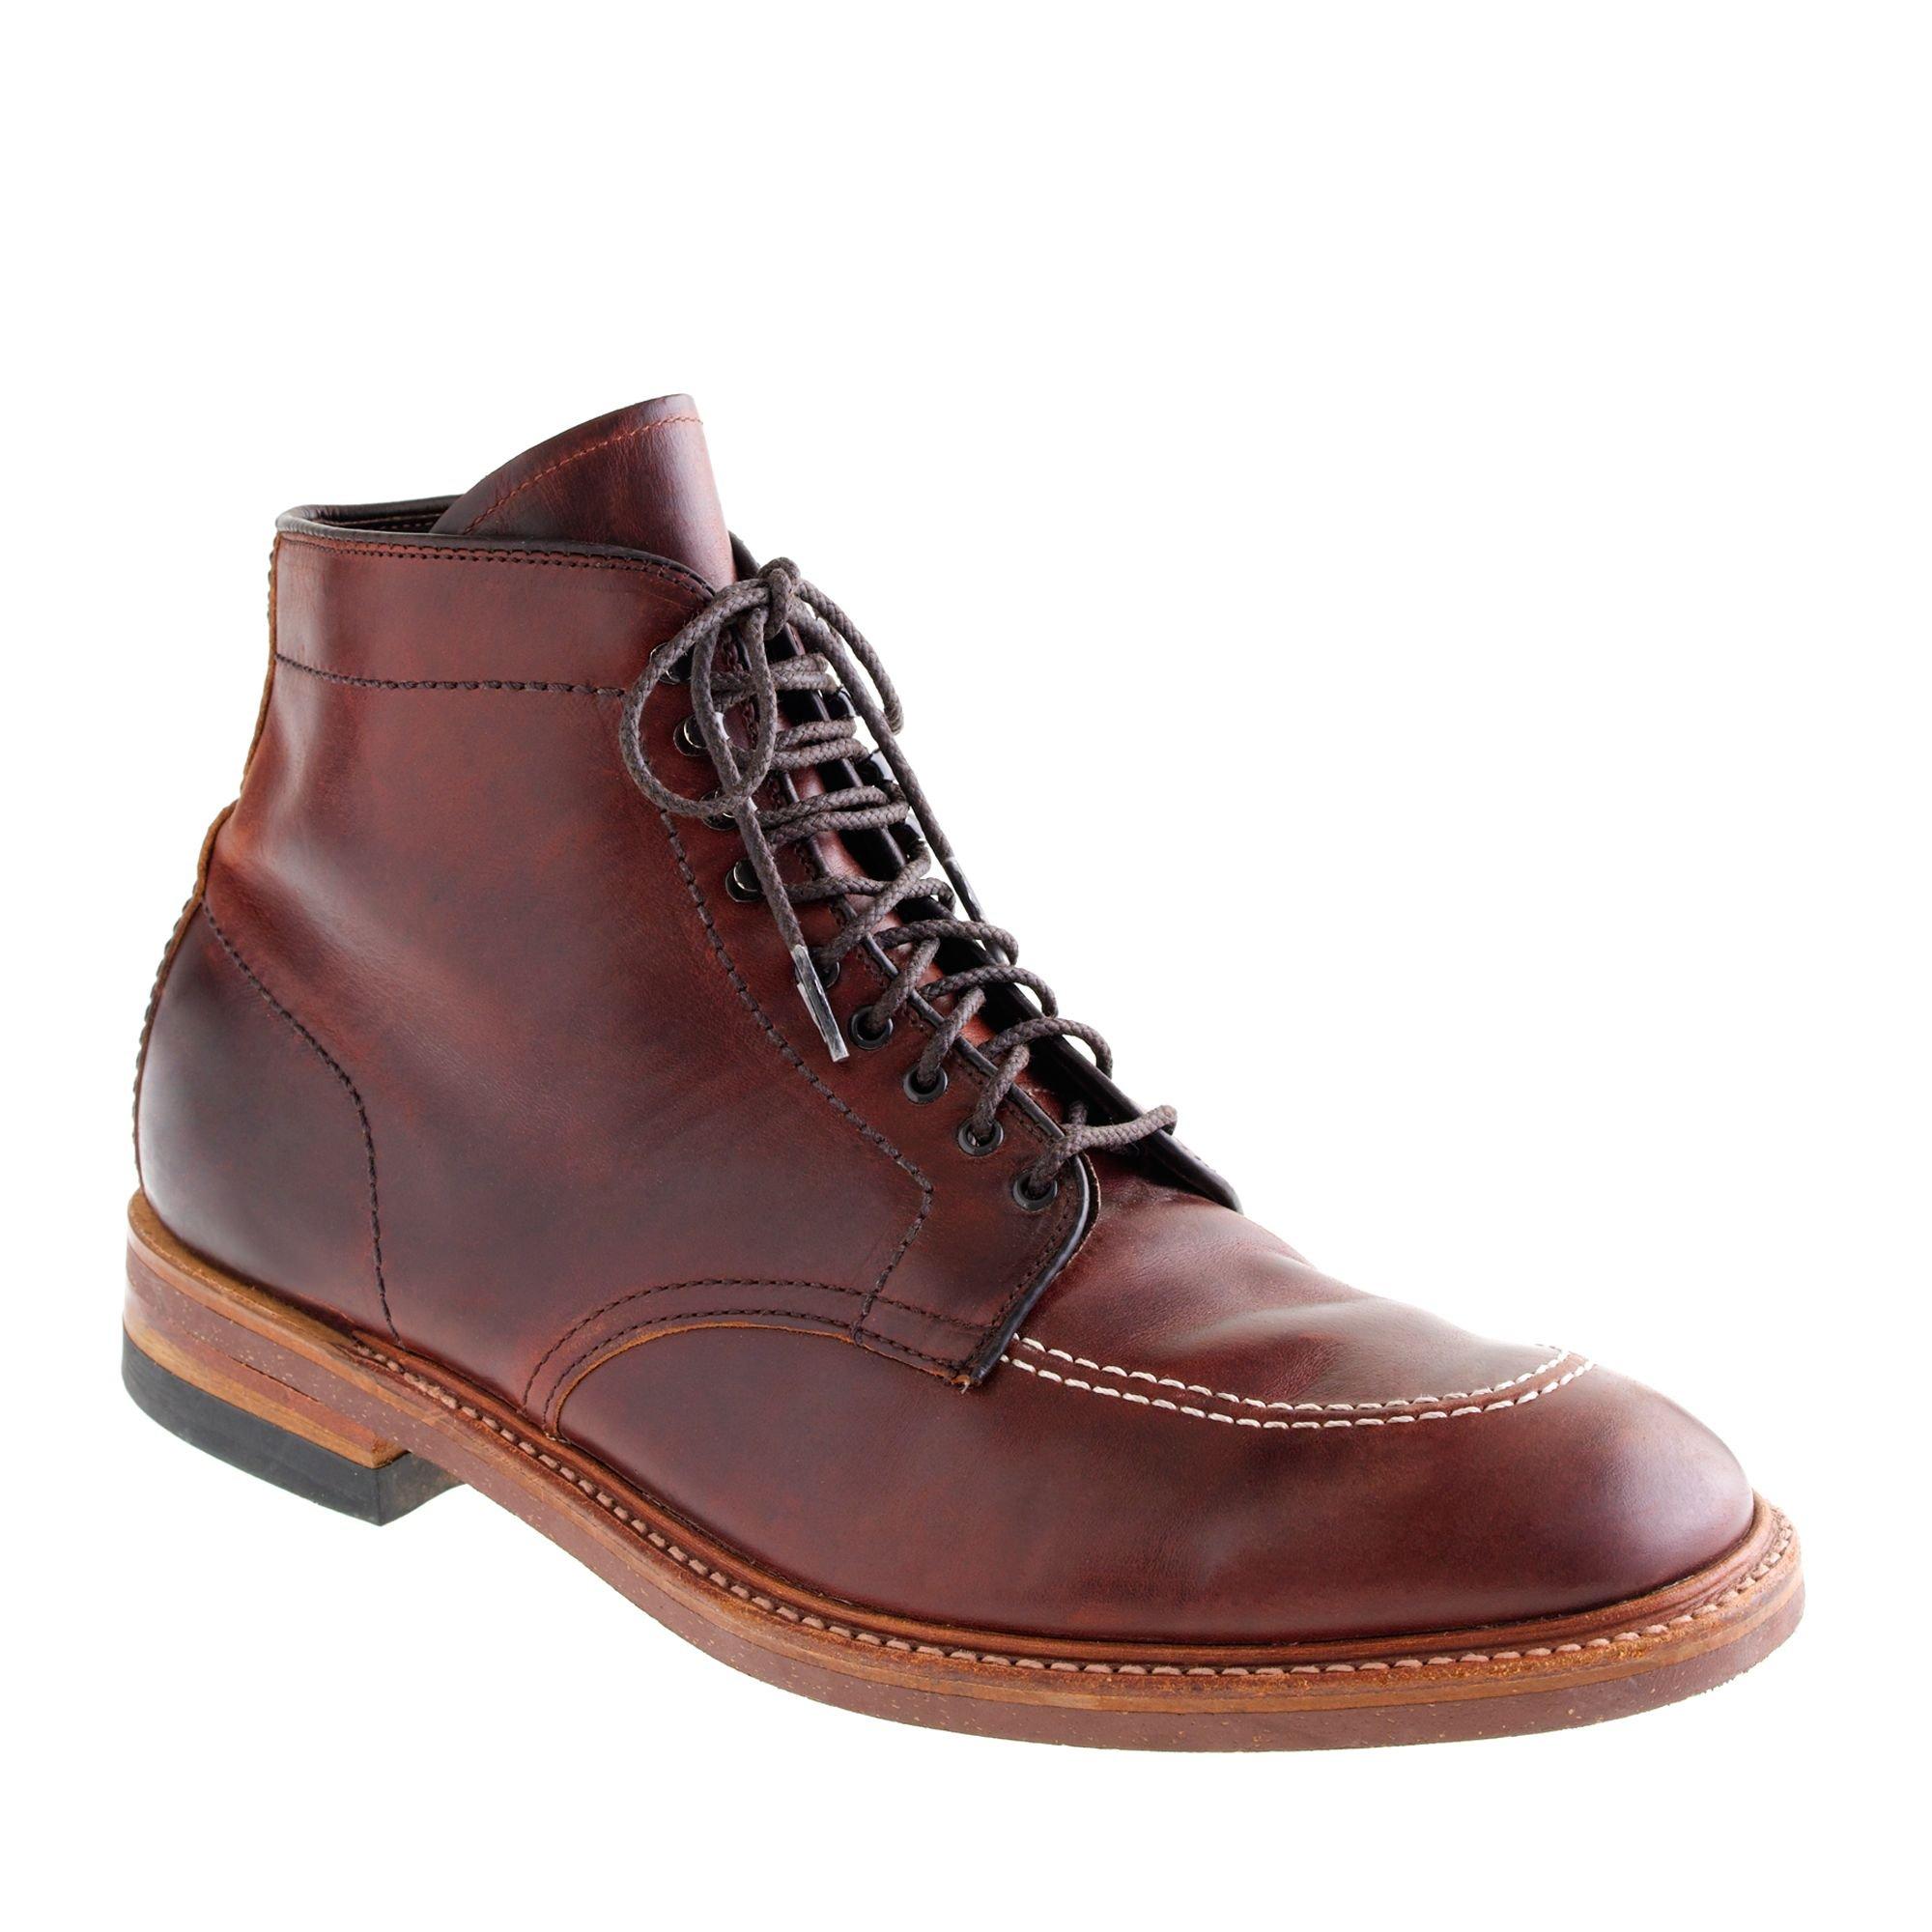 New England Shoe Company